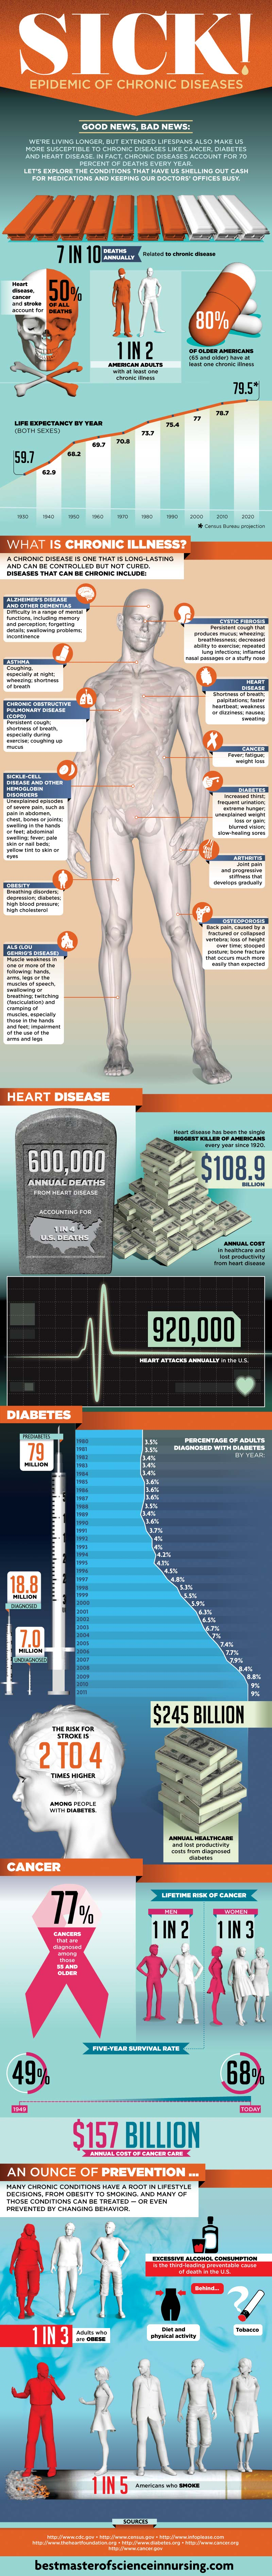 Sick-Epidemic-Of-Chrnonic-Disease-Infographic-infographicsmania.jpg